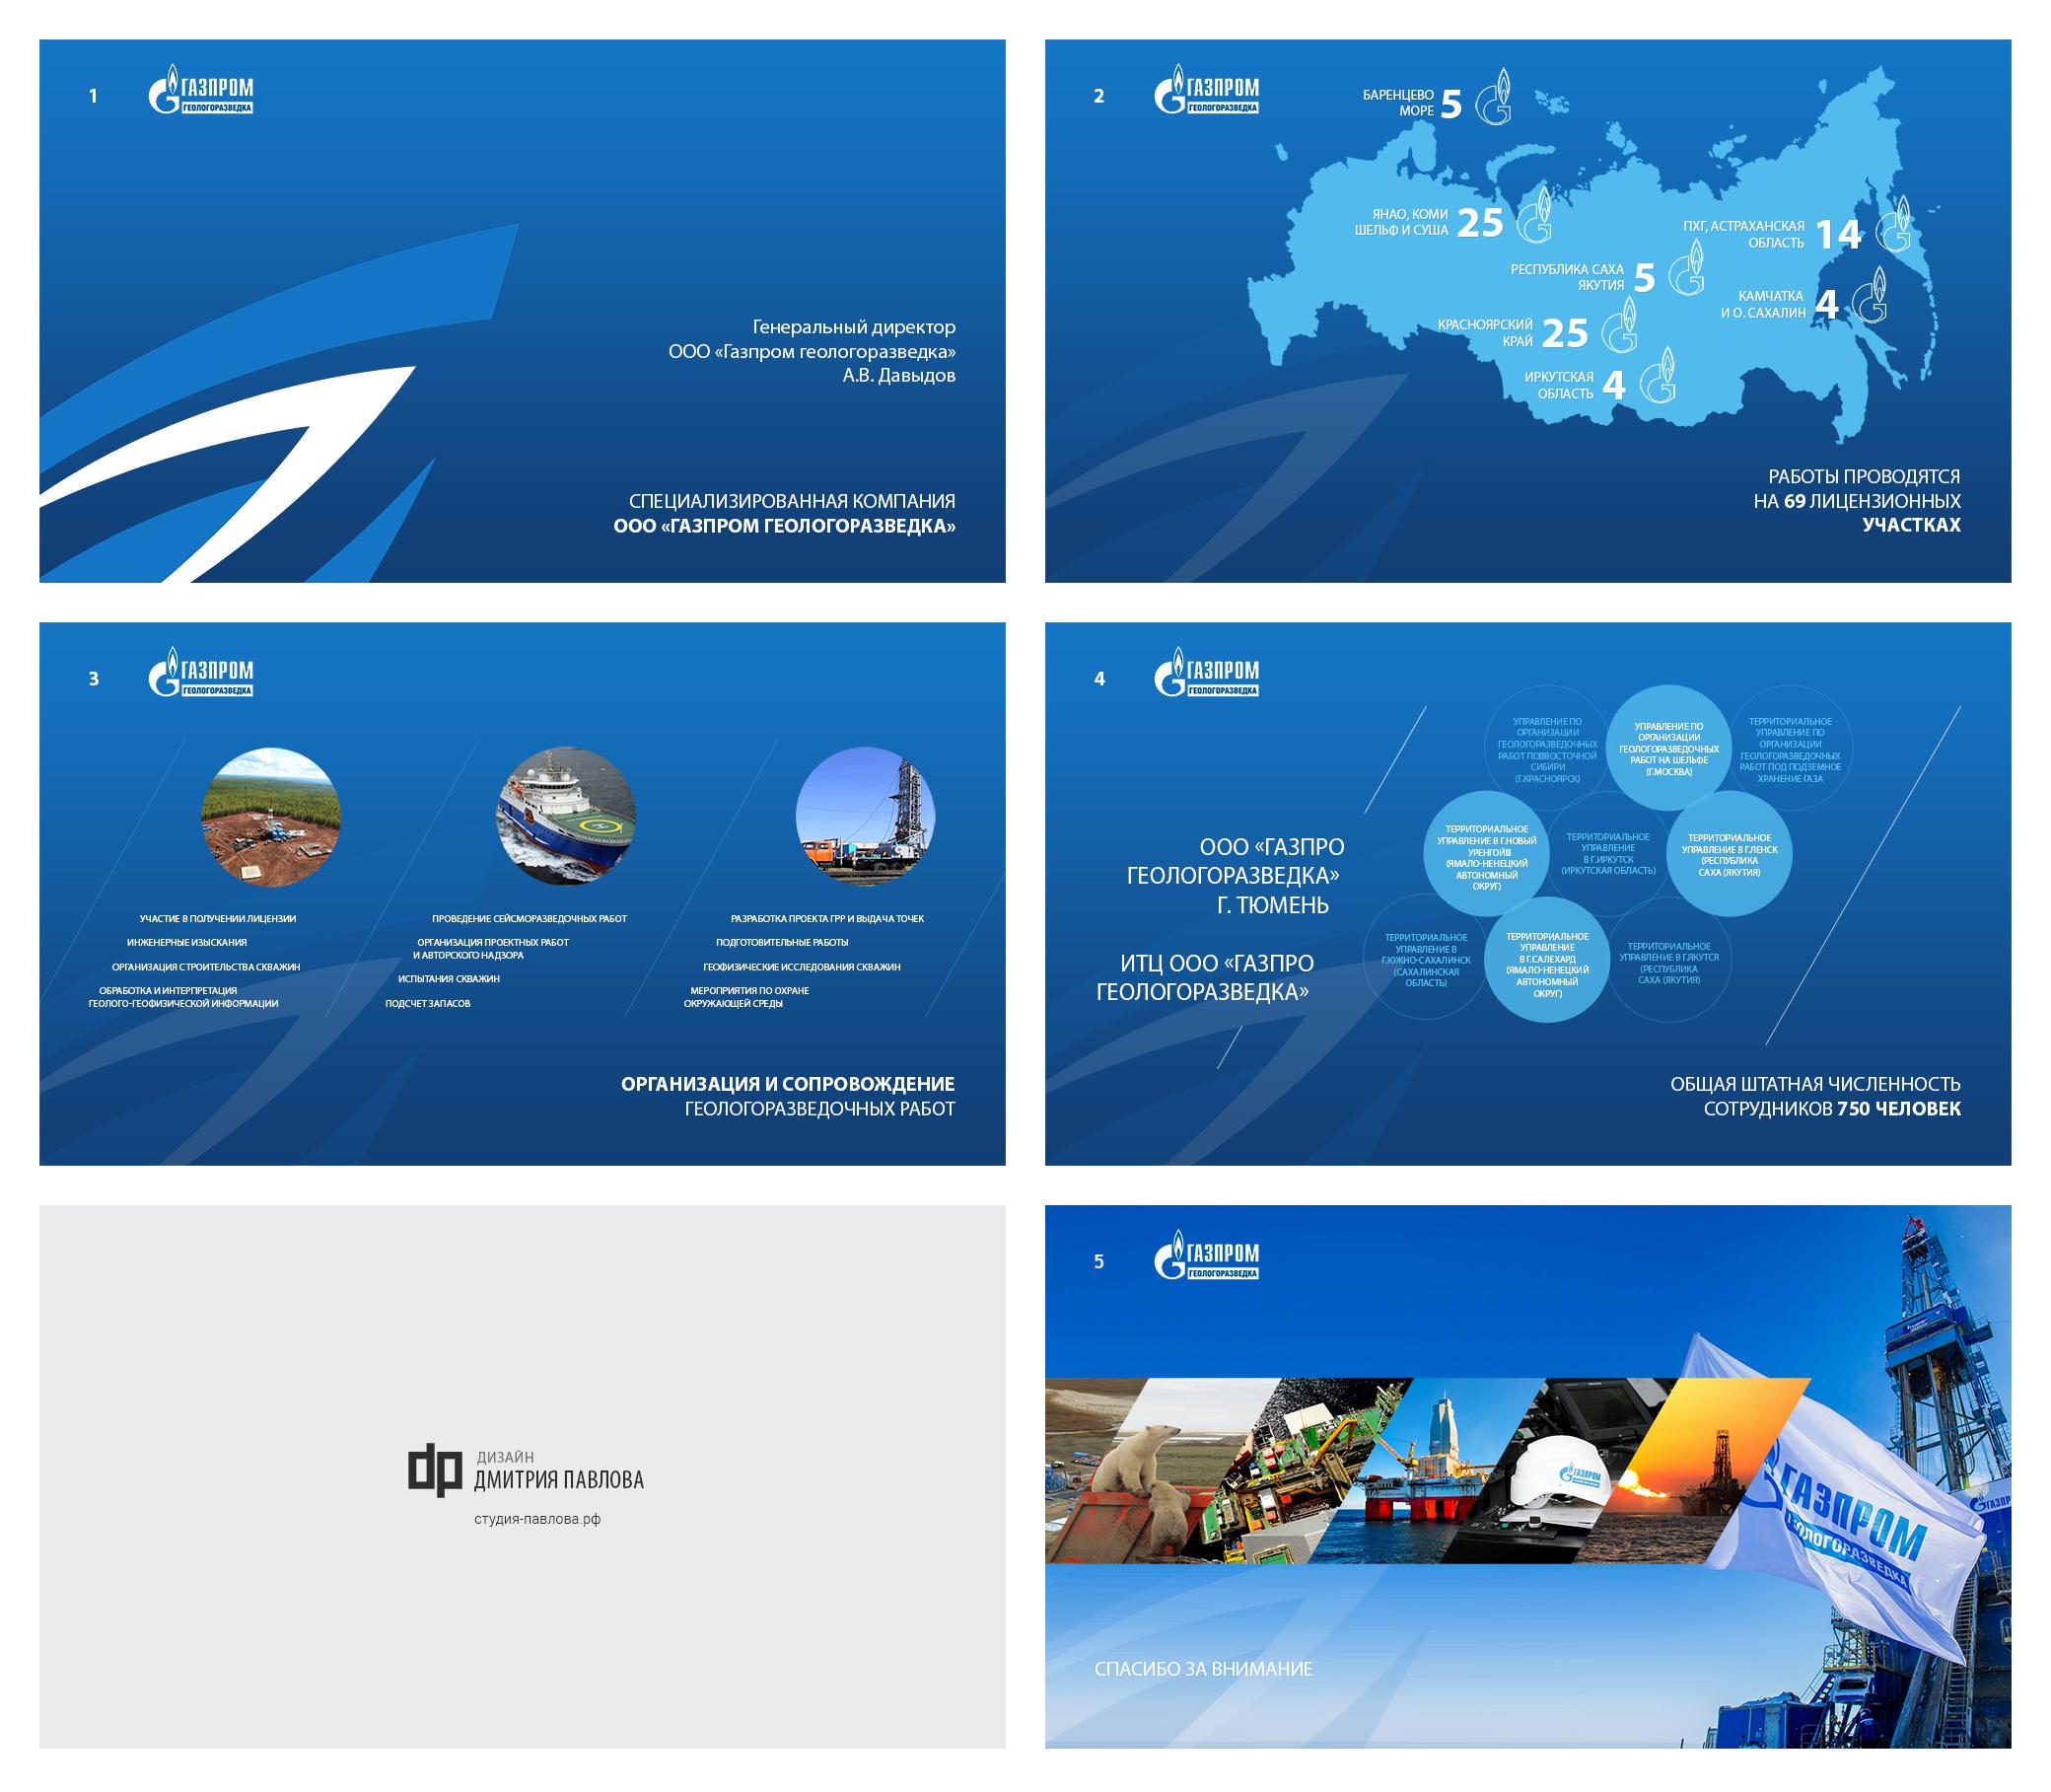 Газпром – слайды